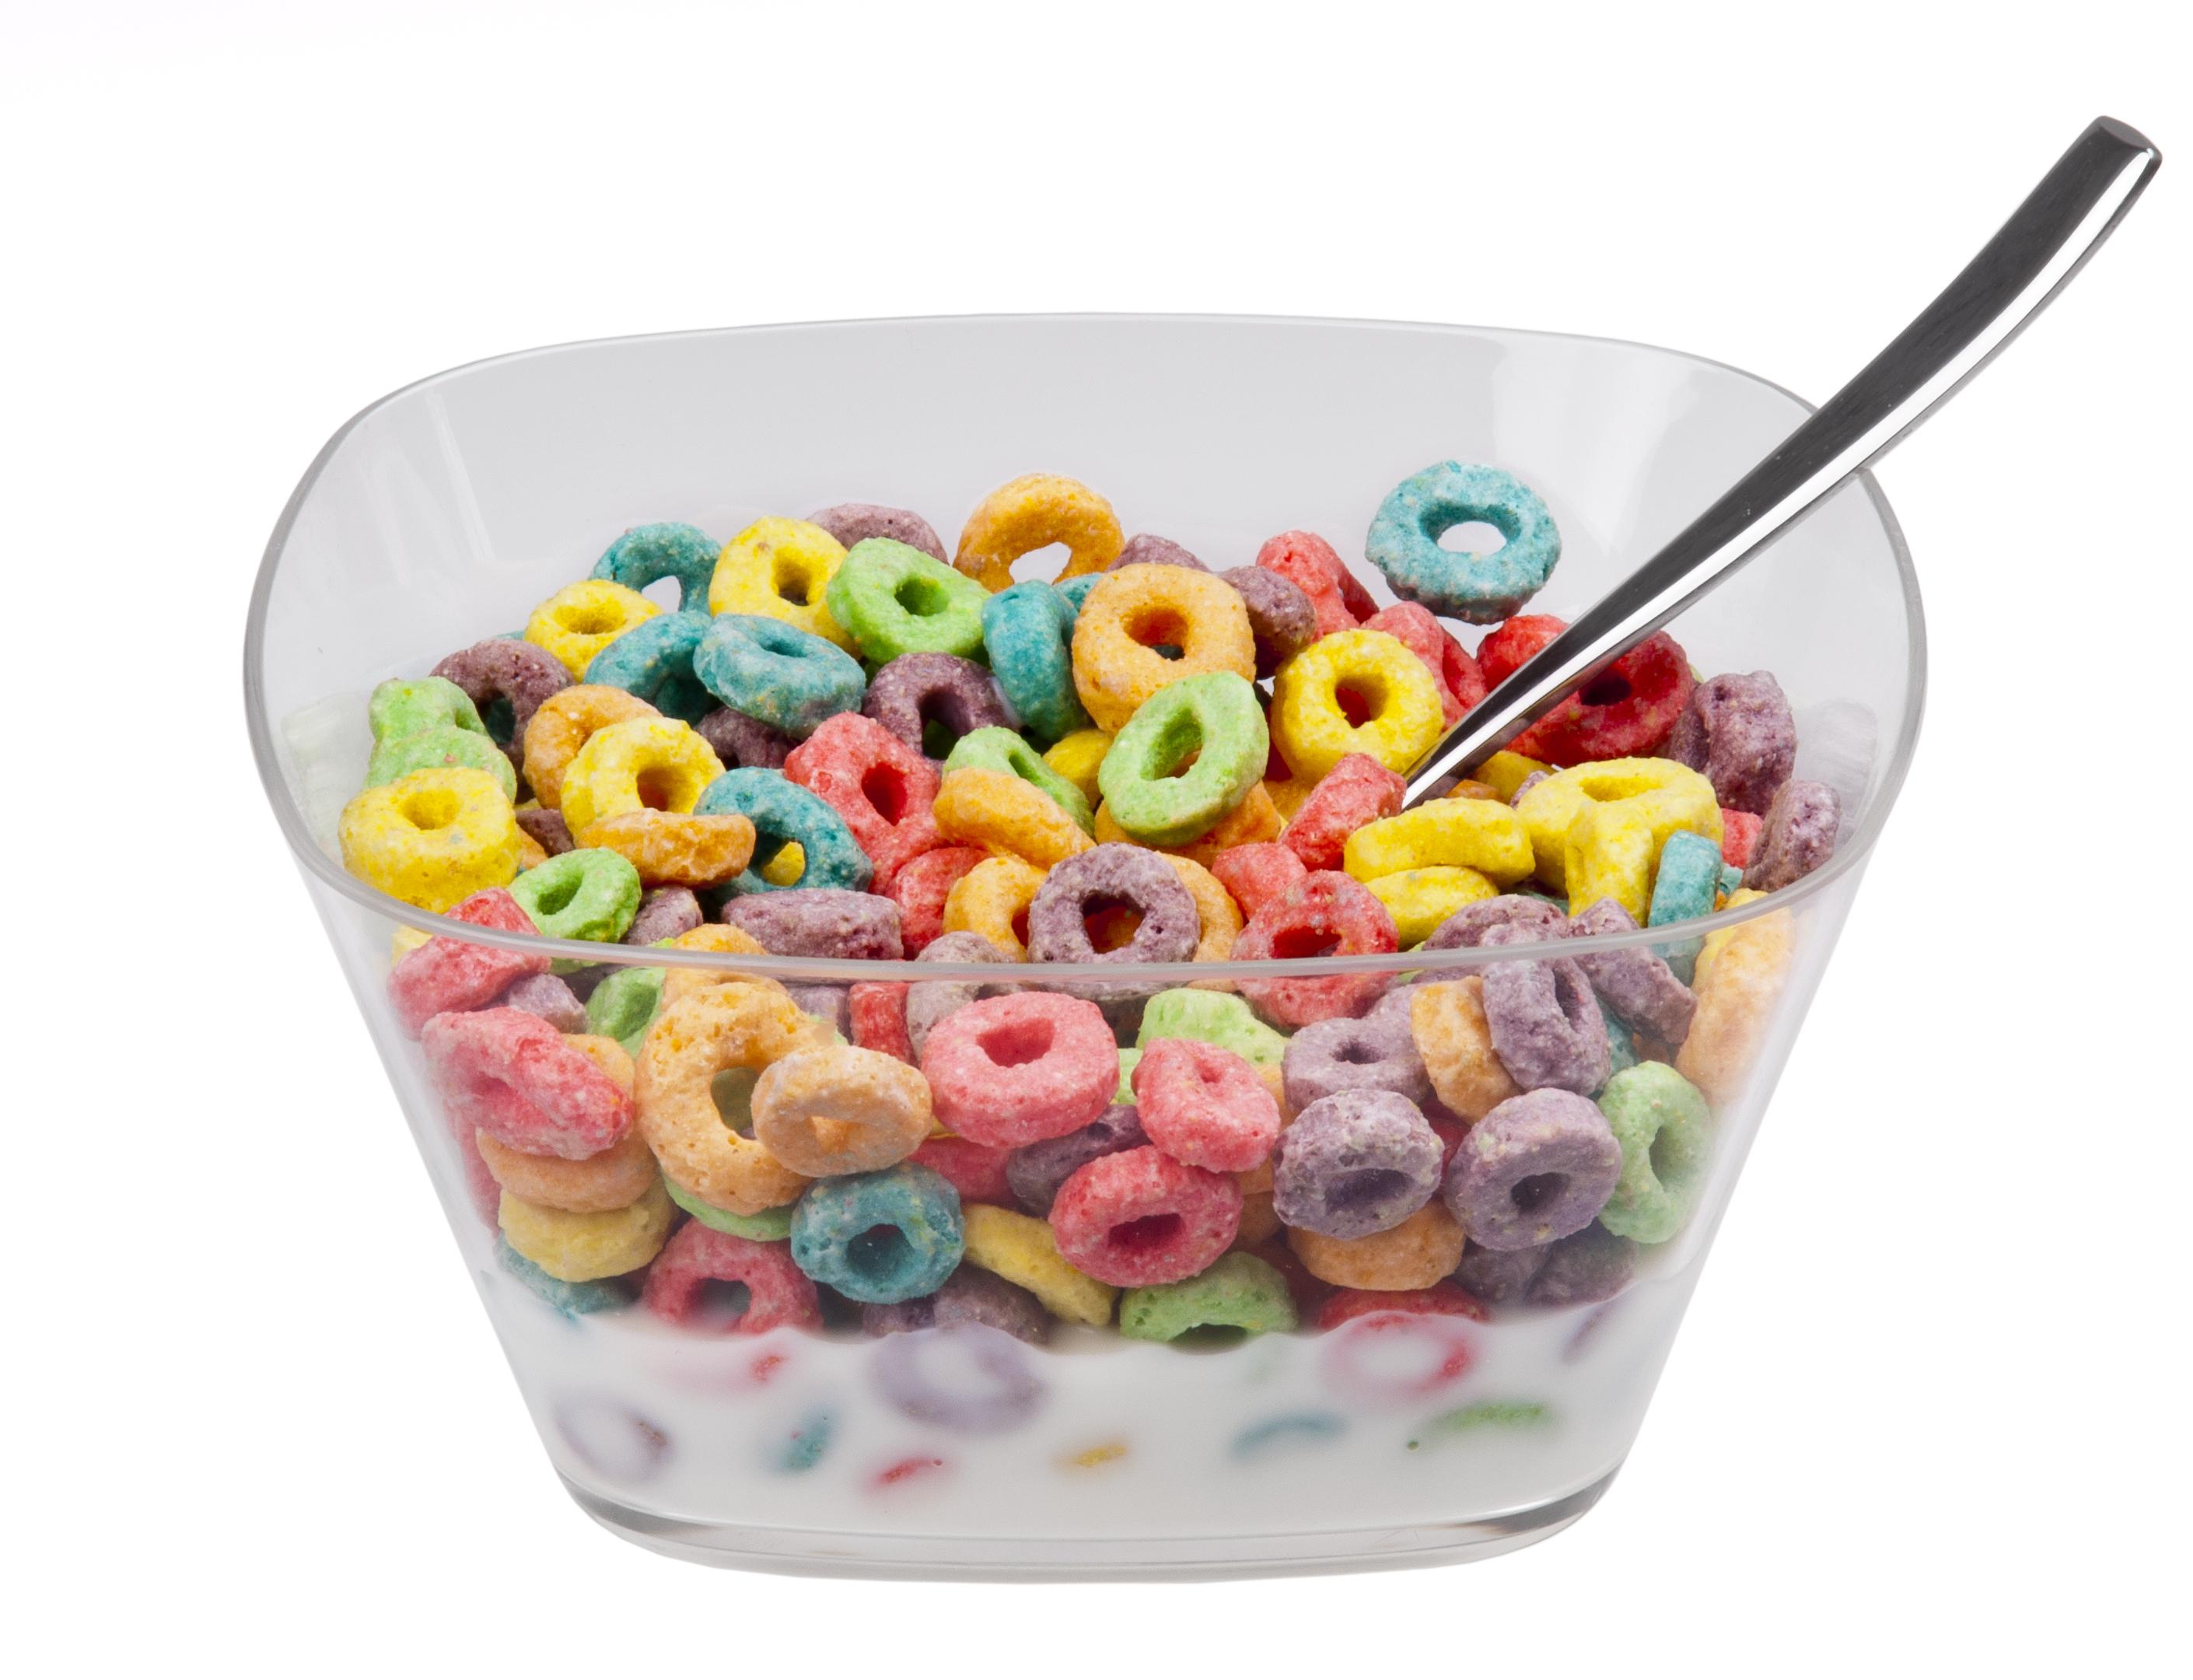 Cheerios Cereal Box Clipart.